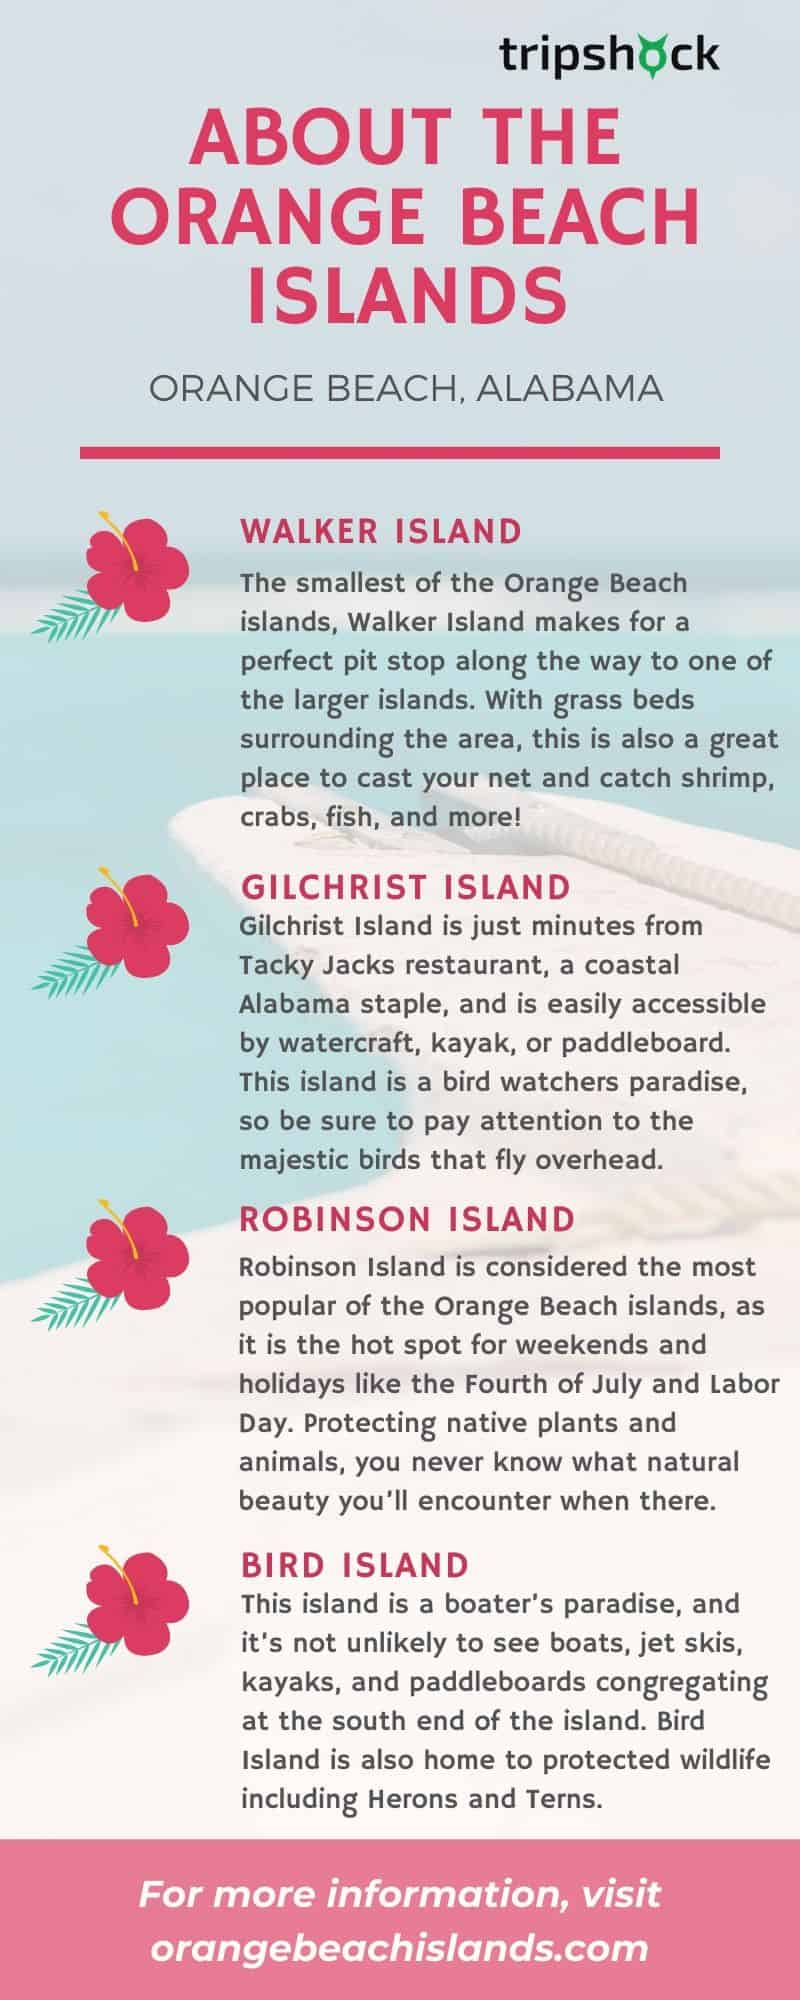 About the Orange Beach Islands